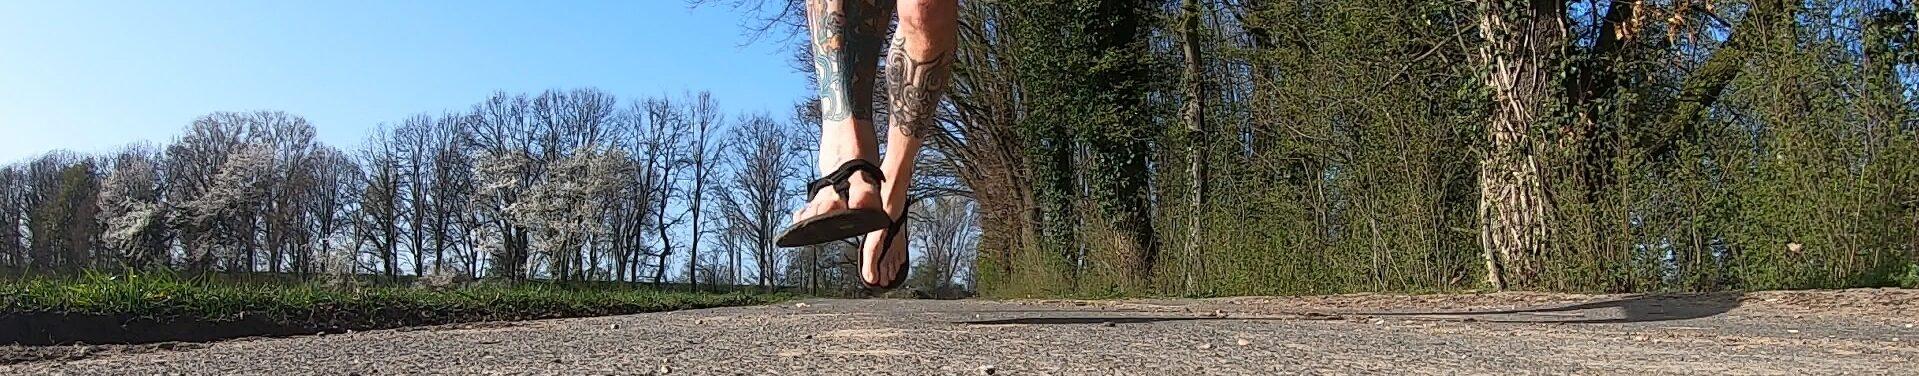 Ich laufe